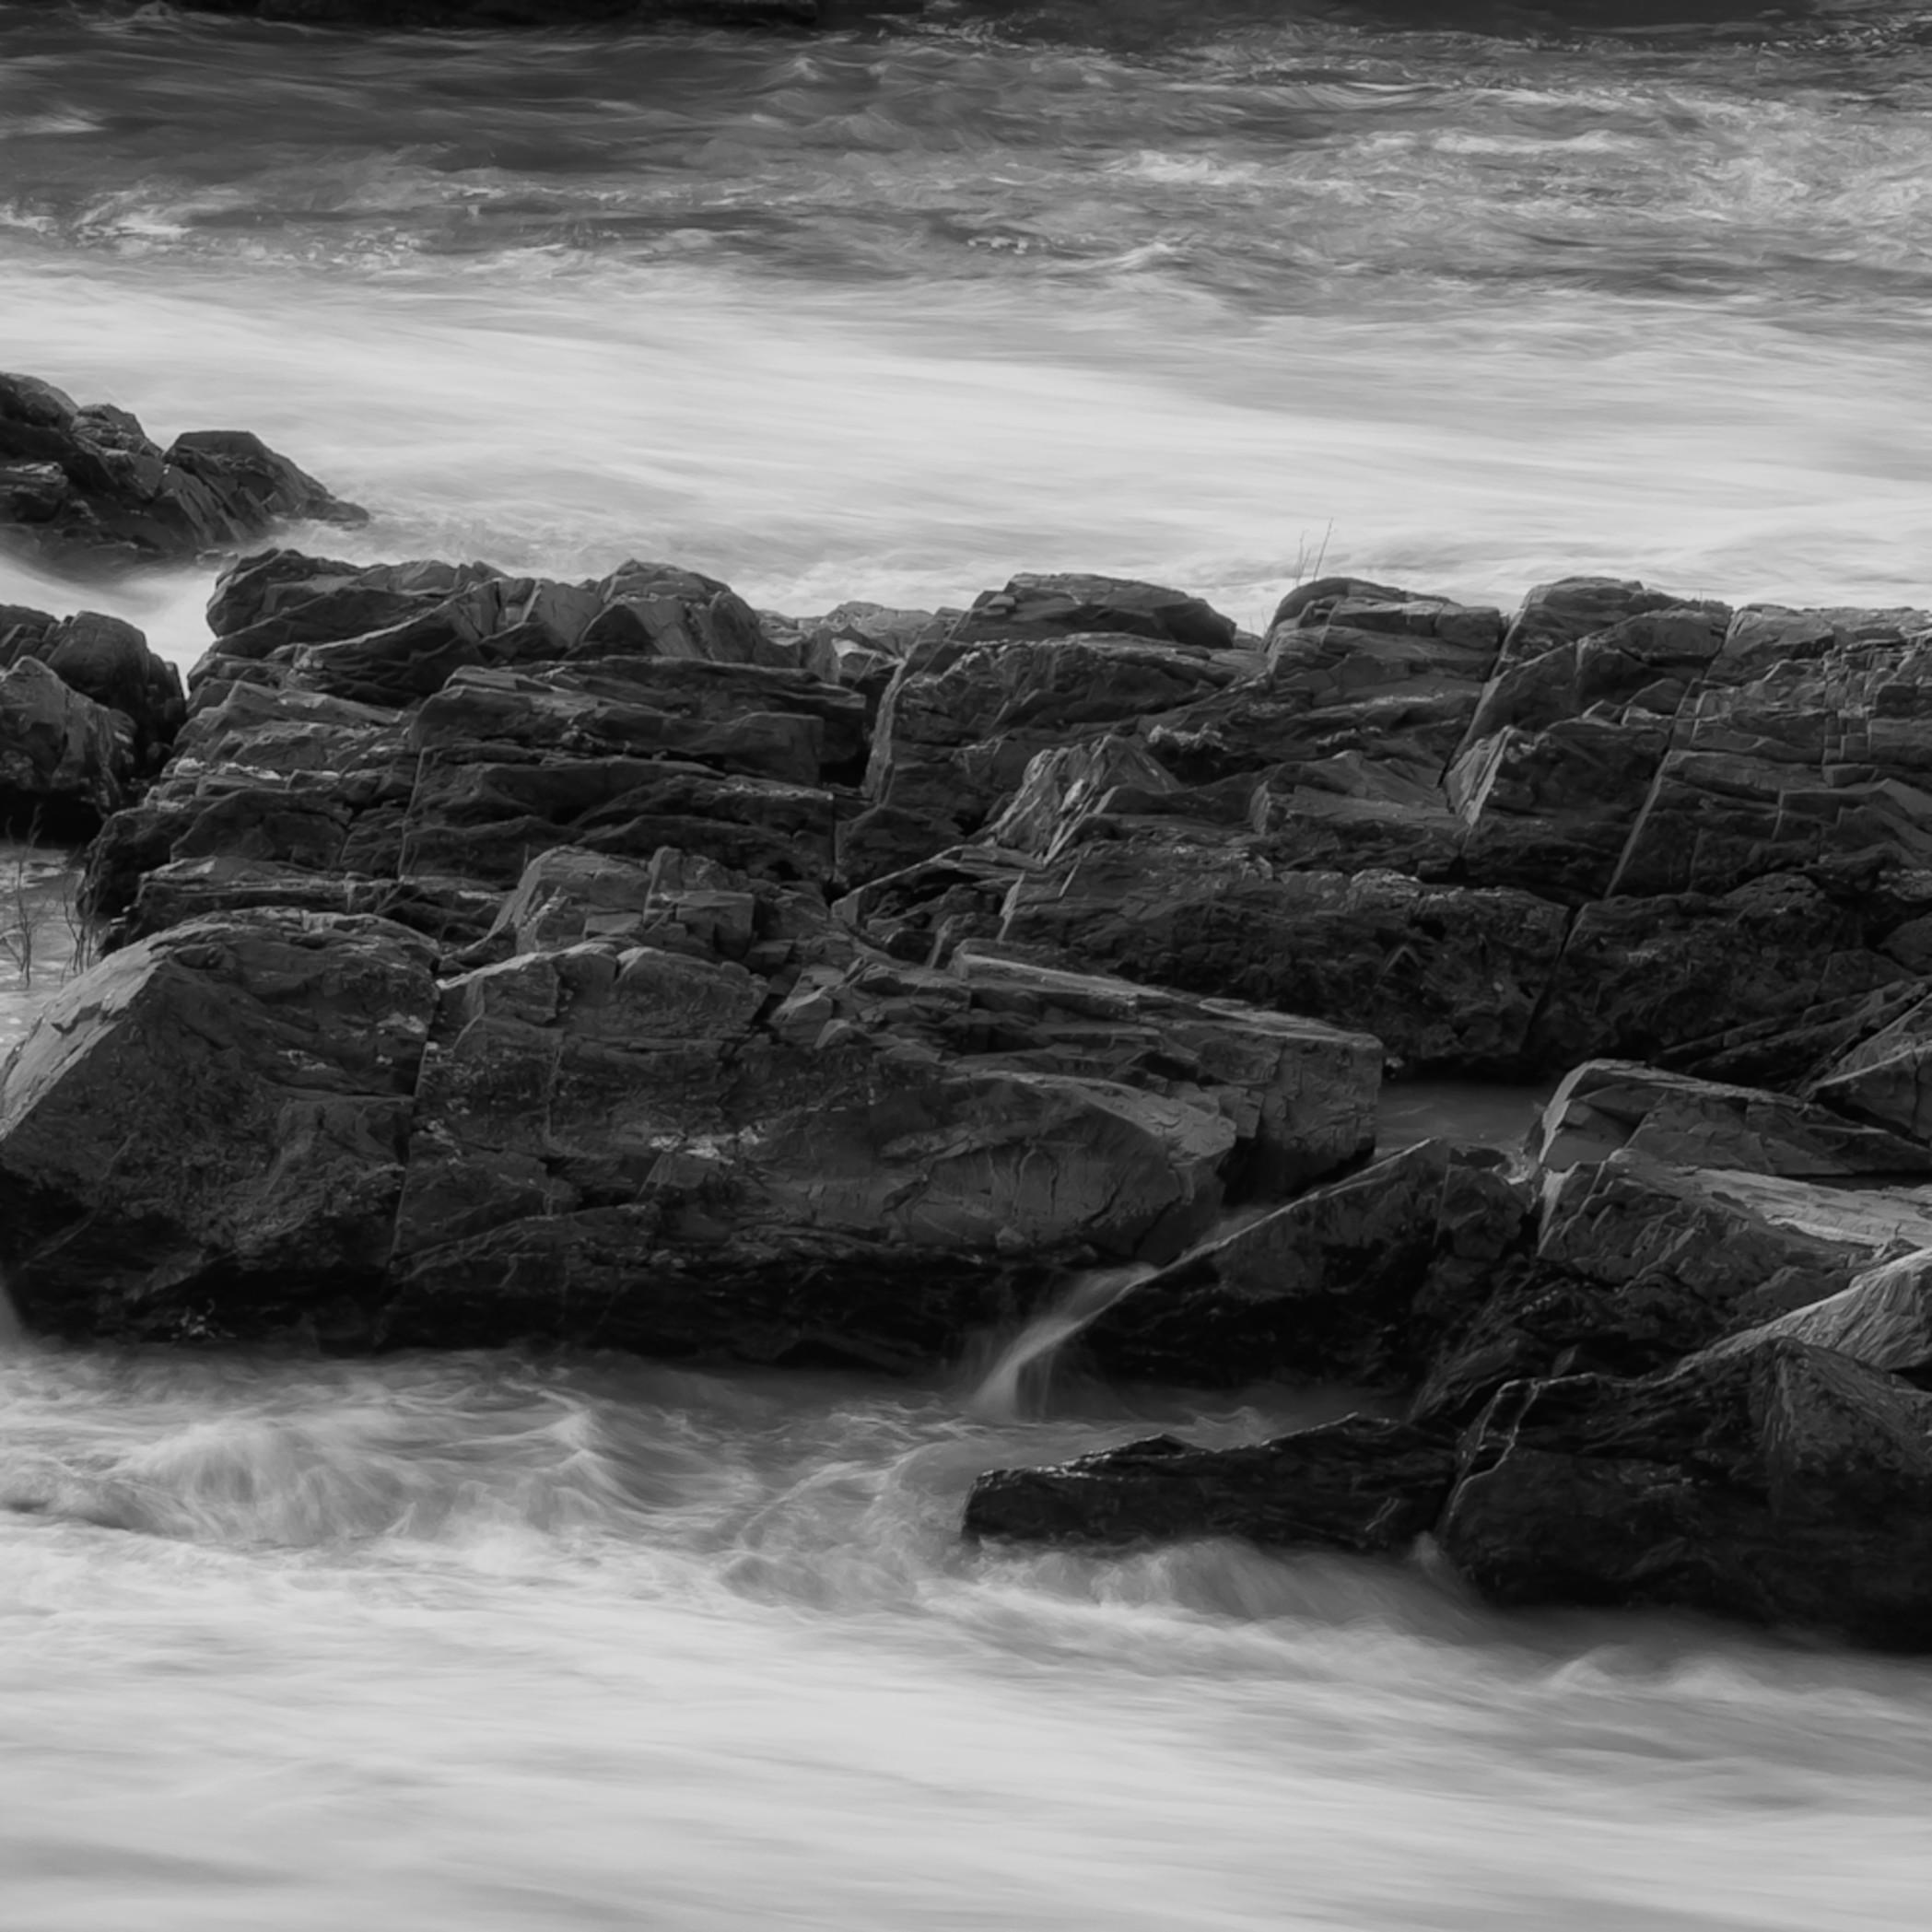 Alone among the rapids exkxgc